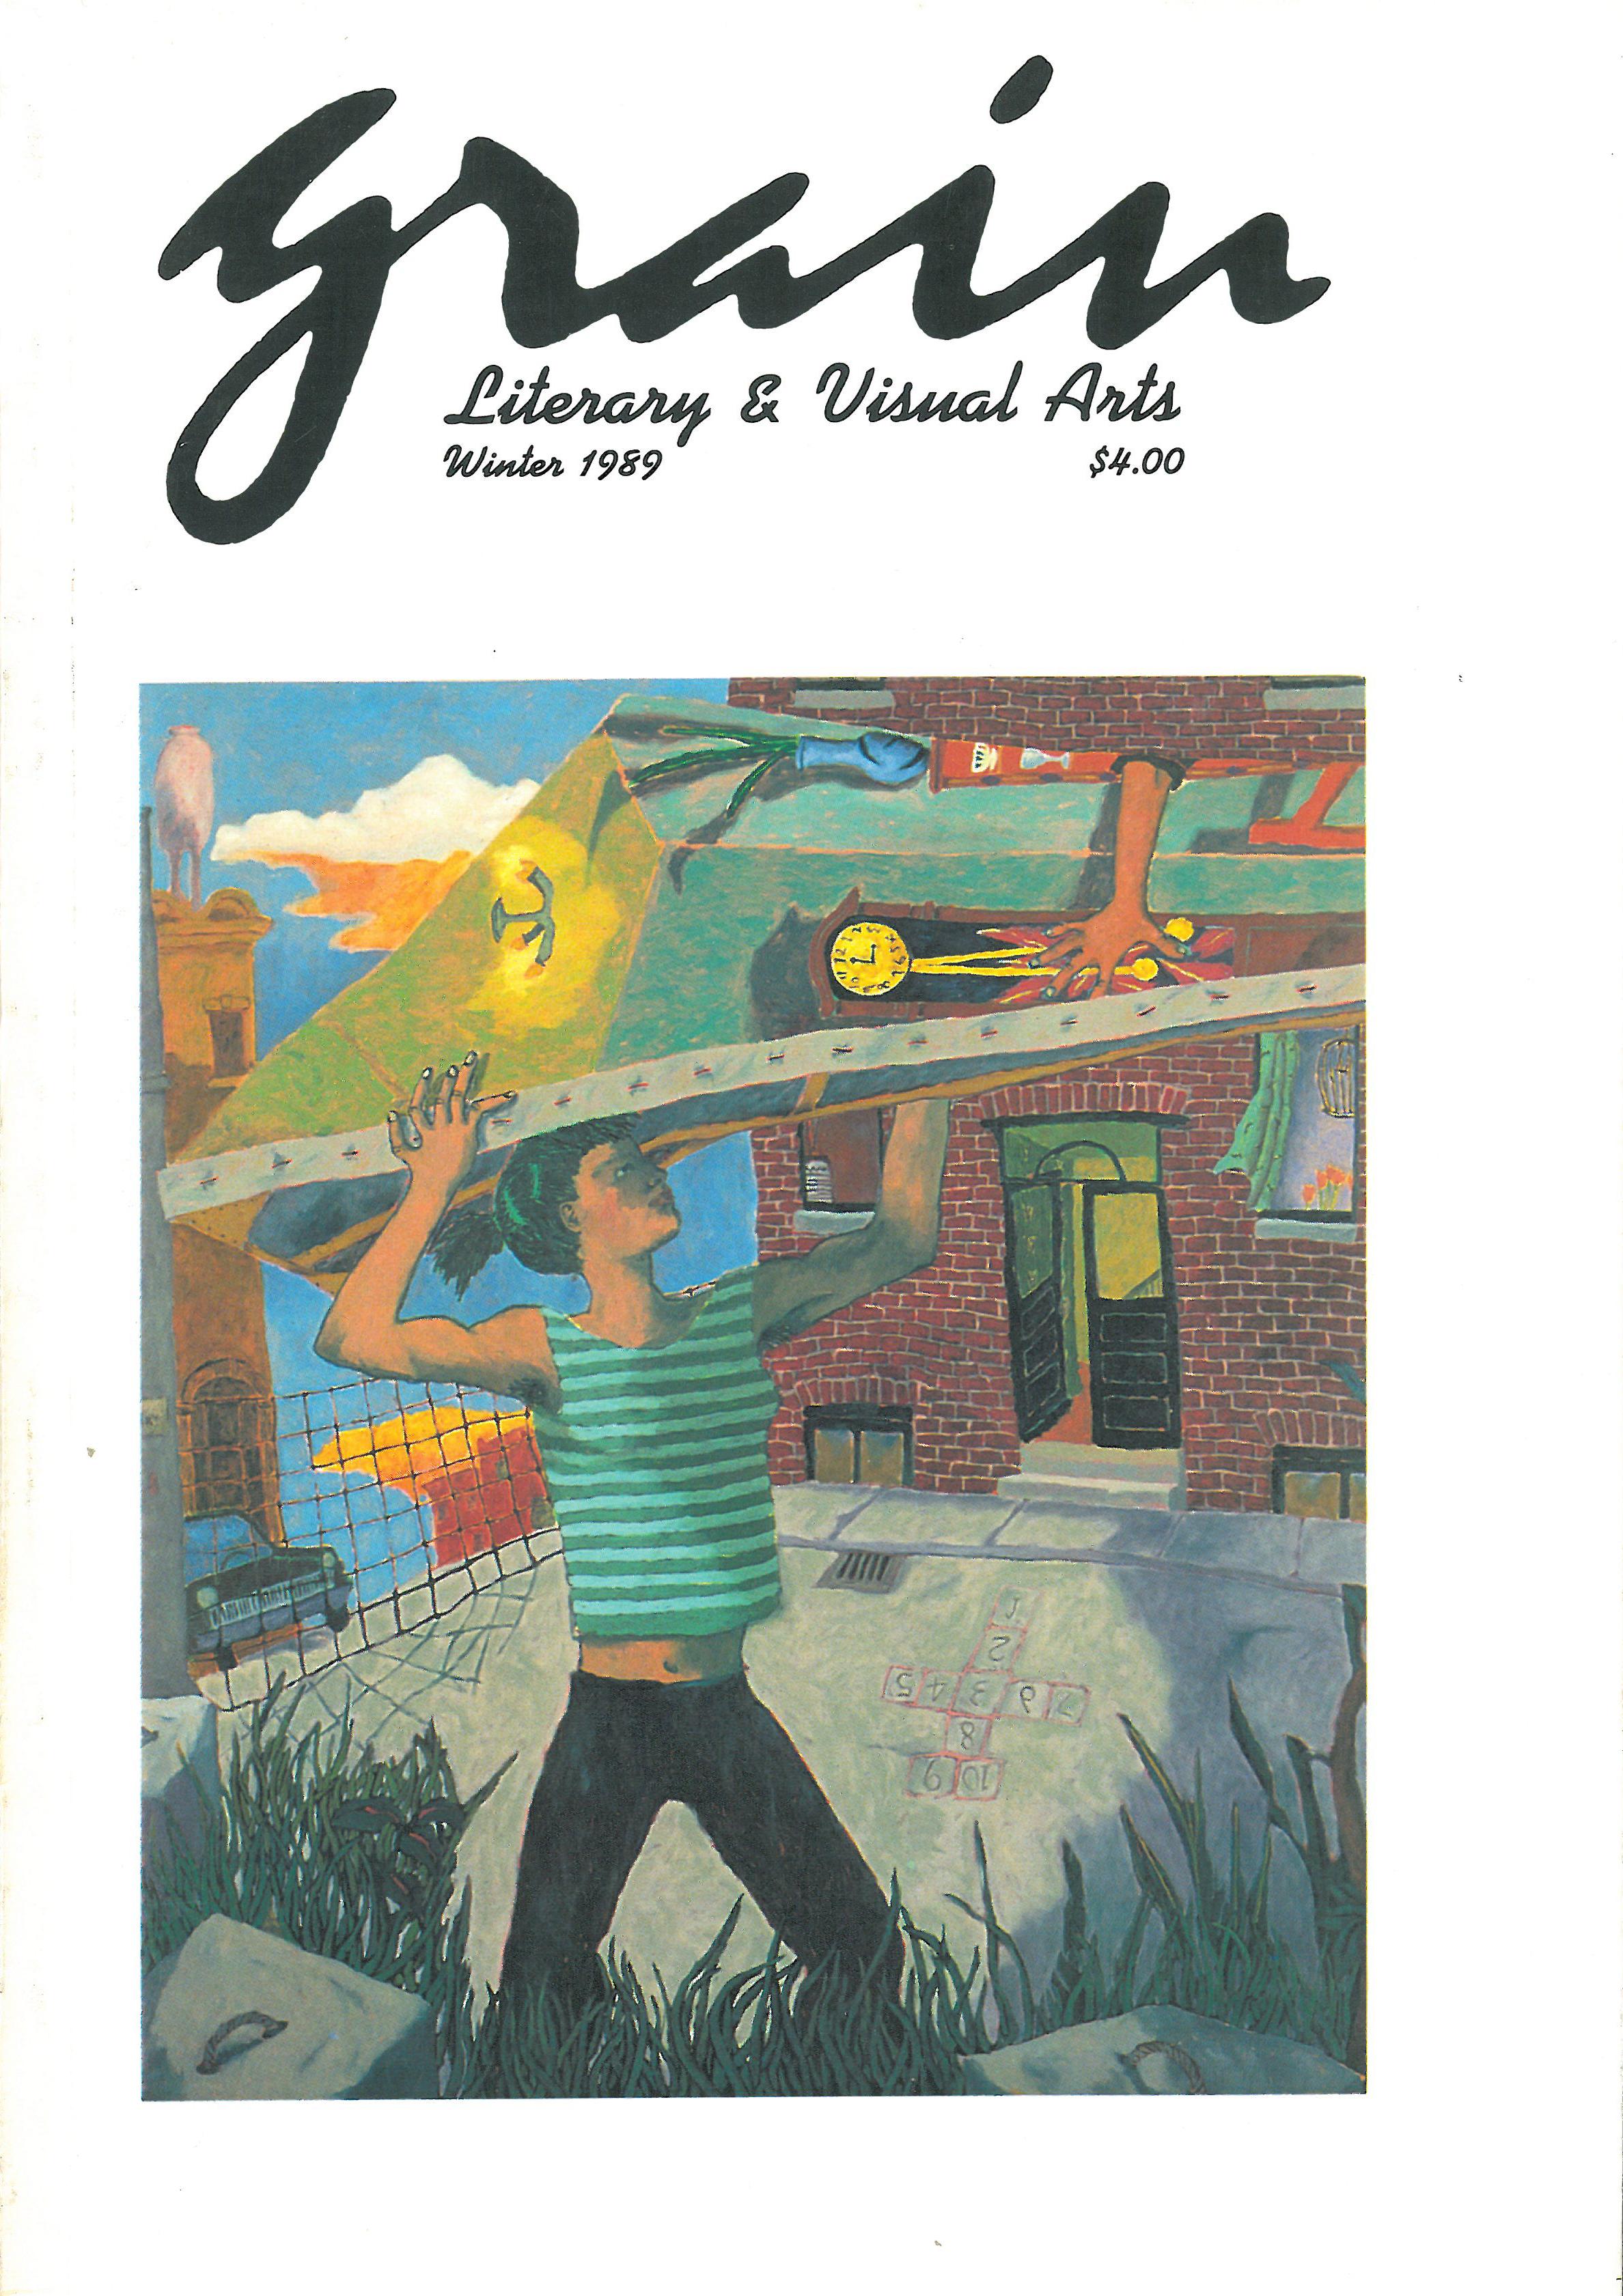 17.4 Winter 1989, Postcard Story Winners: The First Short Grain Contest